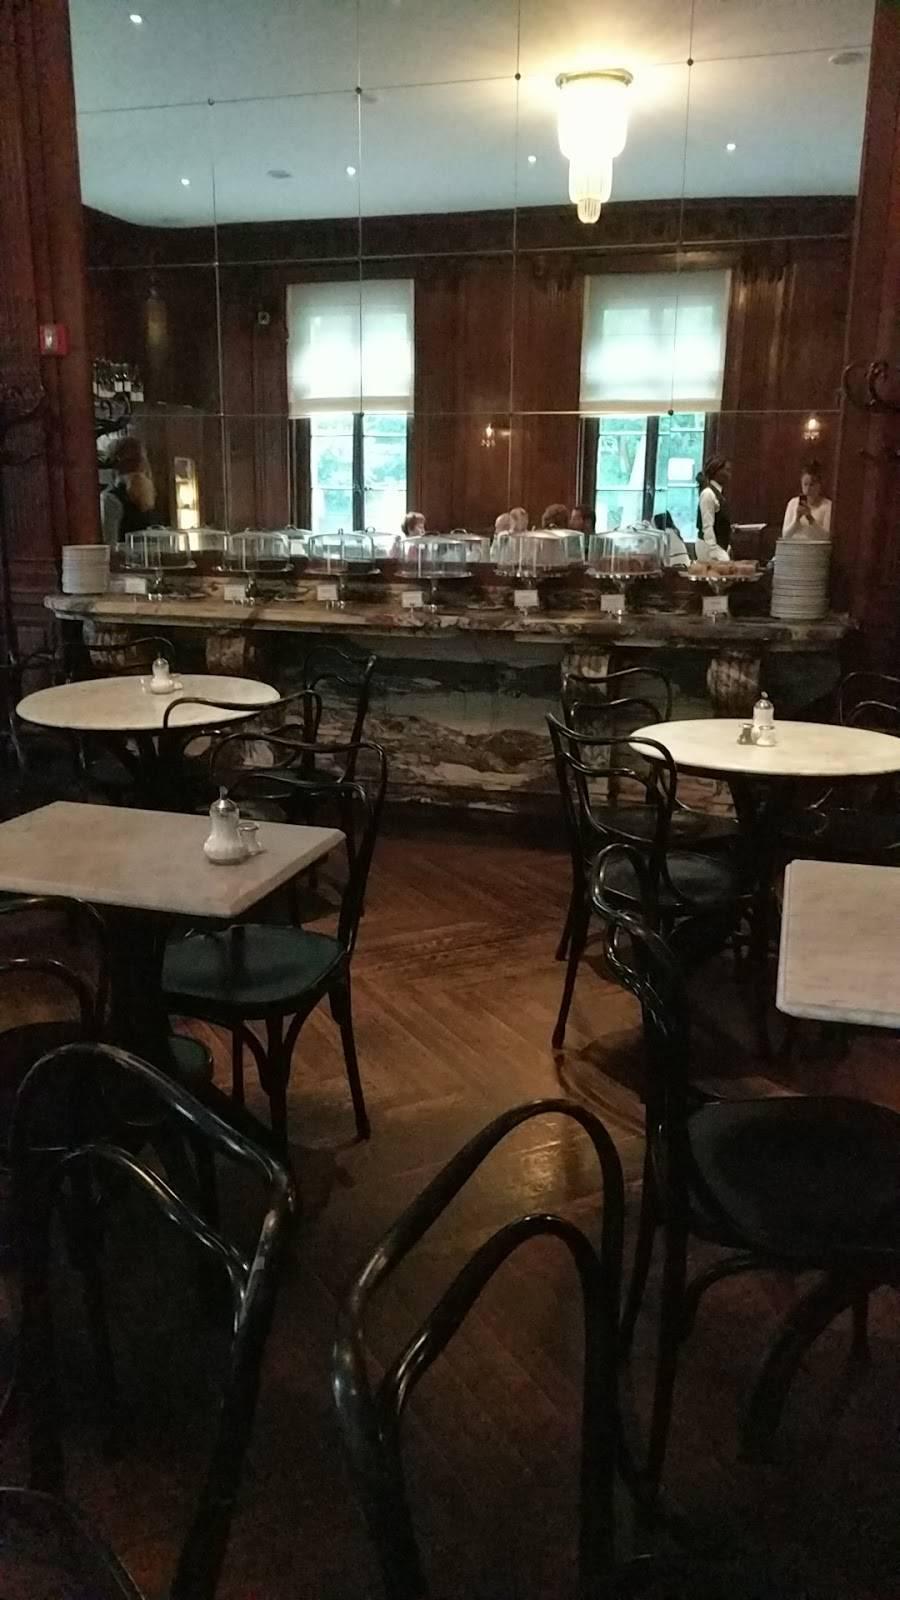 Café Fledermaus   cafe   1048 5th Ave, New York, NY 10028, USA   2122880665 OR +1 212-288-0665